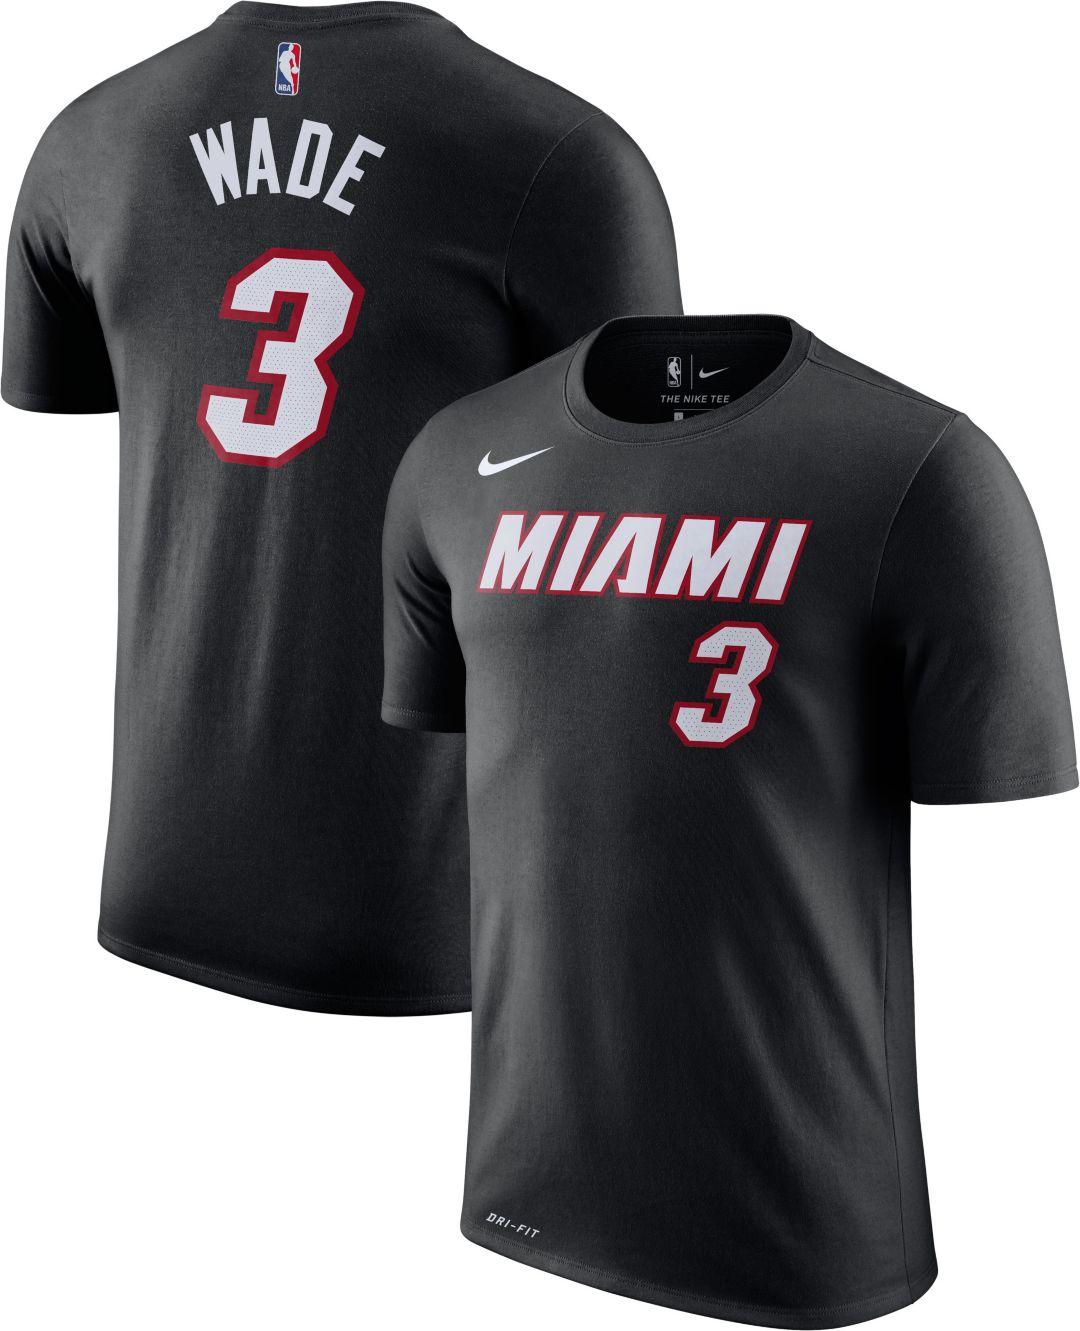 the best attitude b19fd 58358 Nike Men's Miami Heat Dwyane Wade #3 Dri-FIT Black T-Shirt